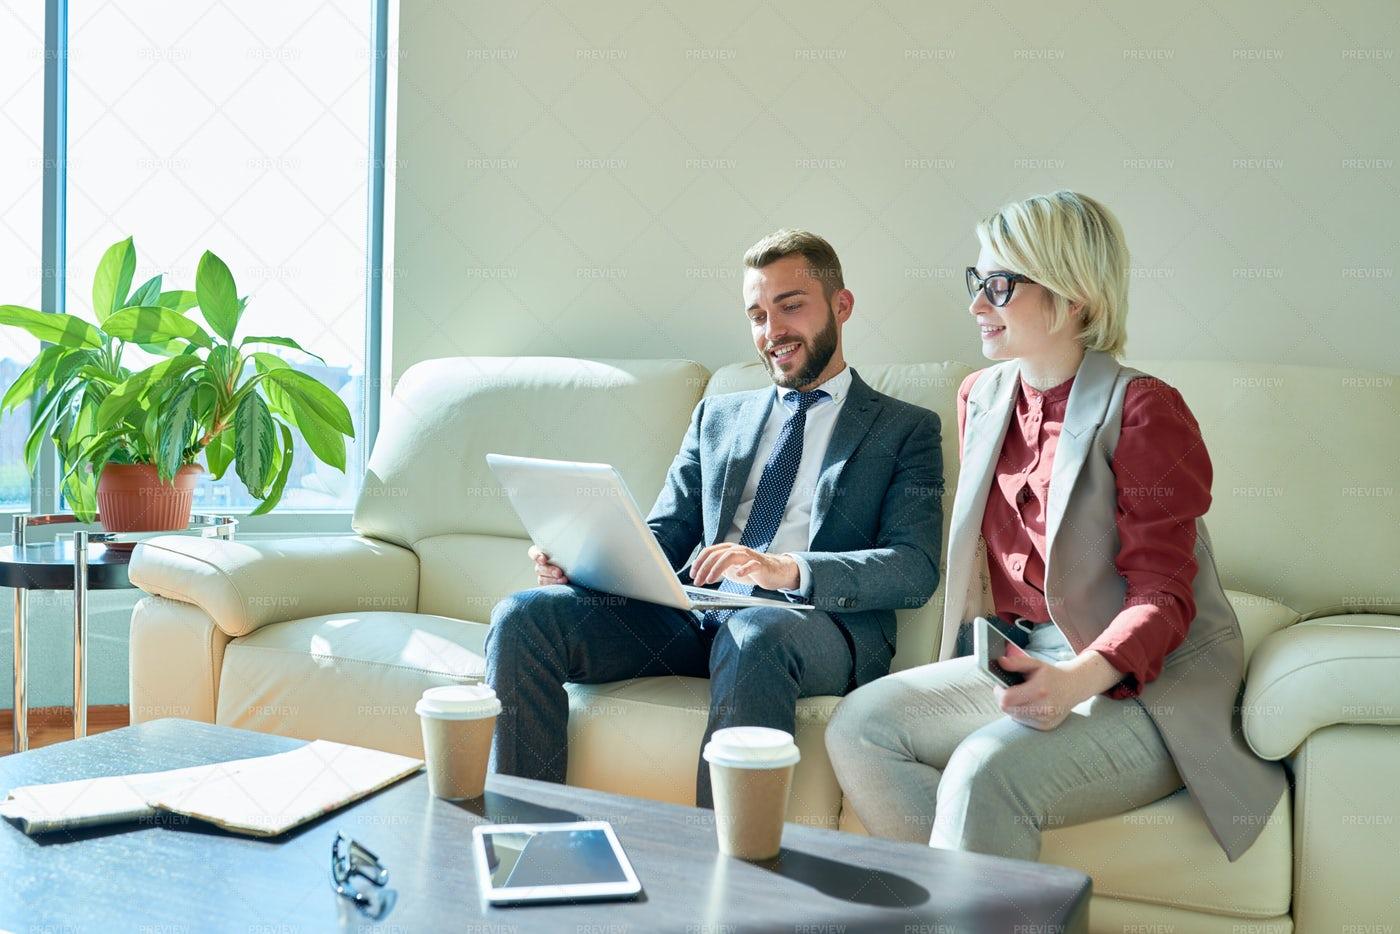 Working Meeting At Employee Lounge: Stock Photos